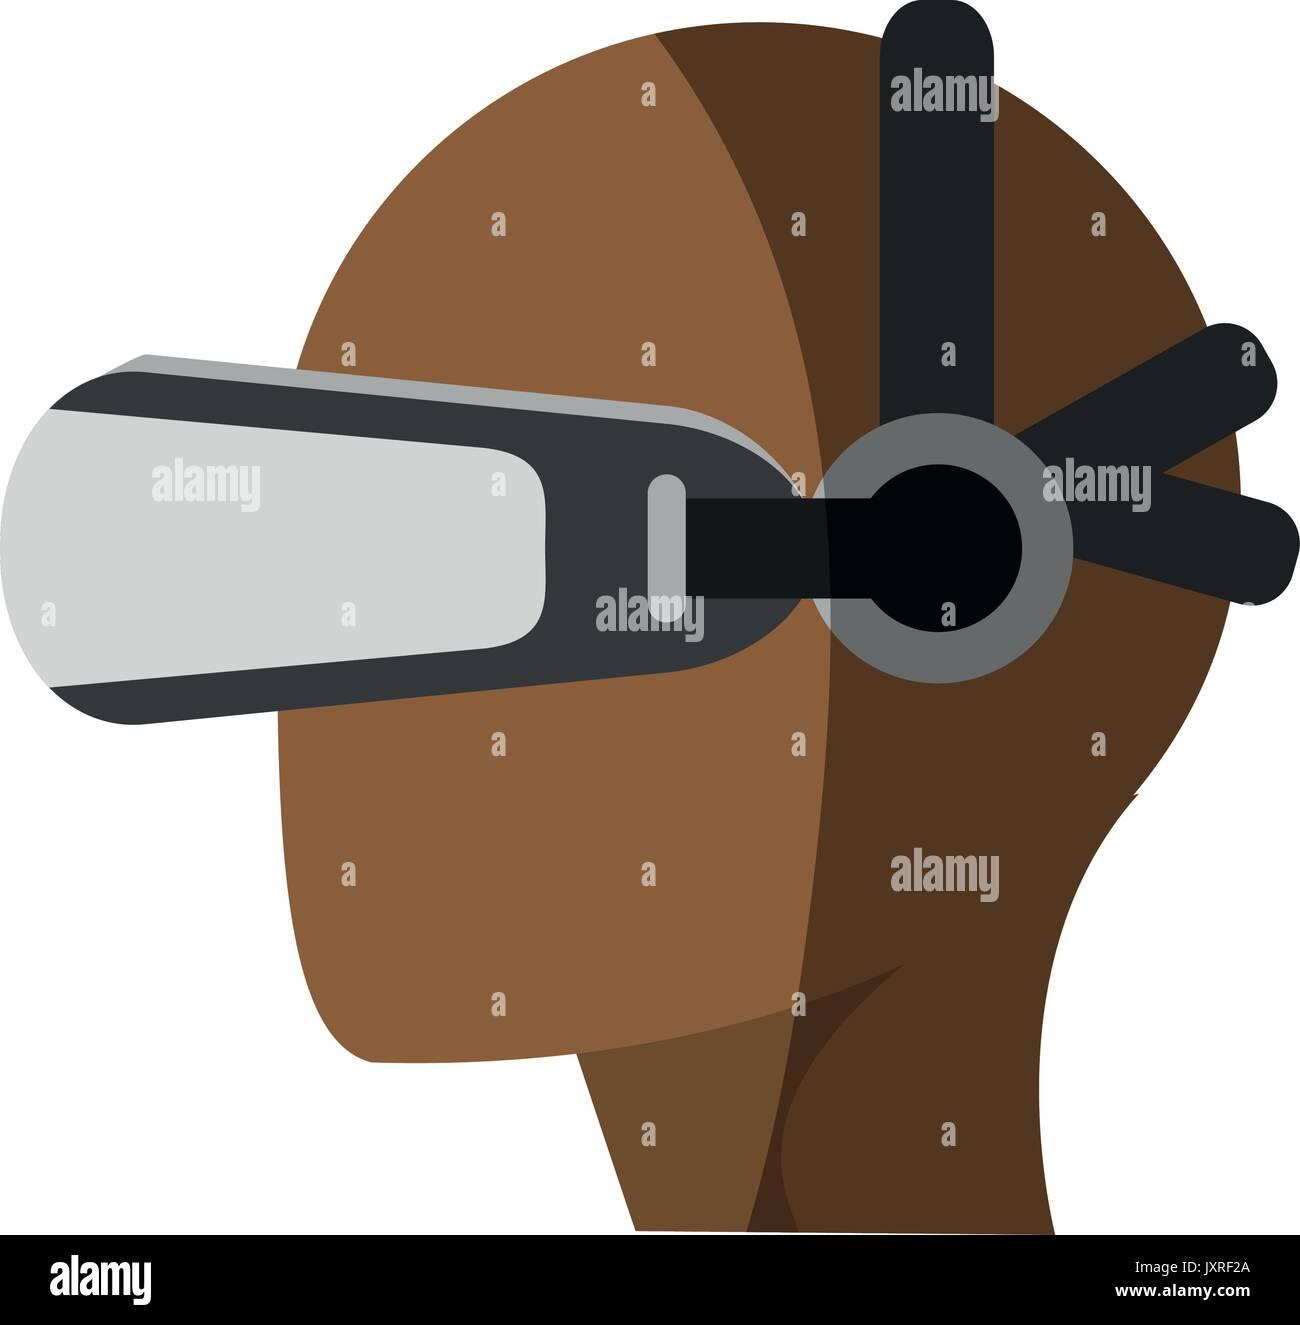 virtual reality gadget icon image - Stock Image